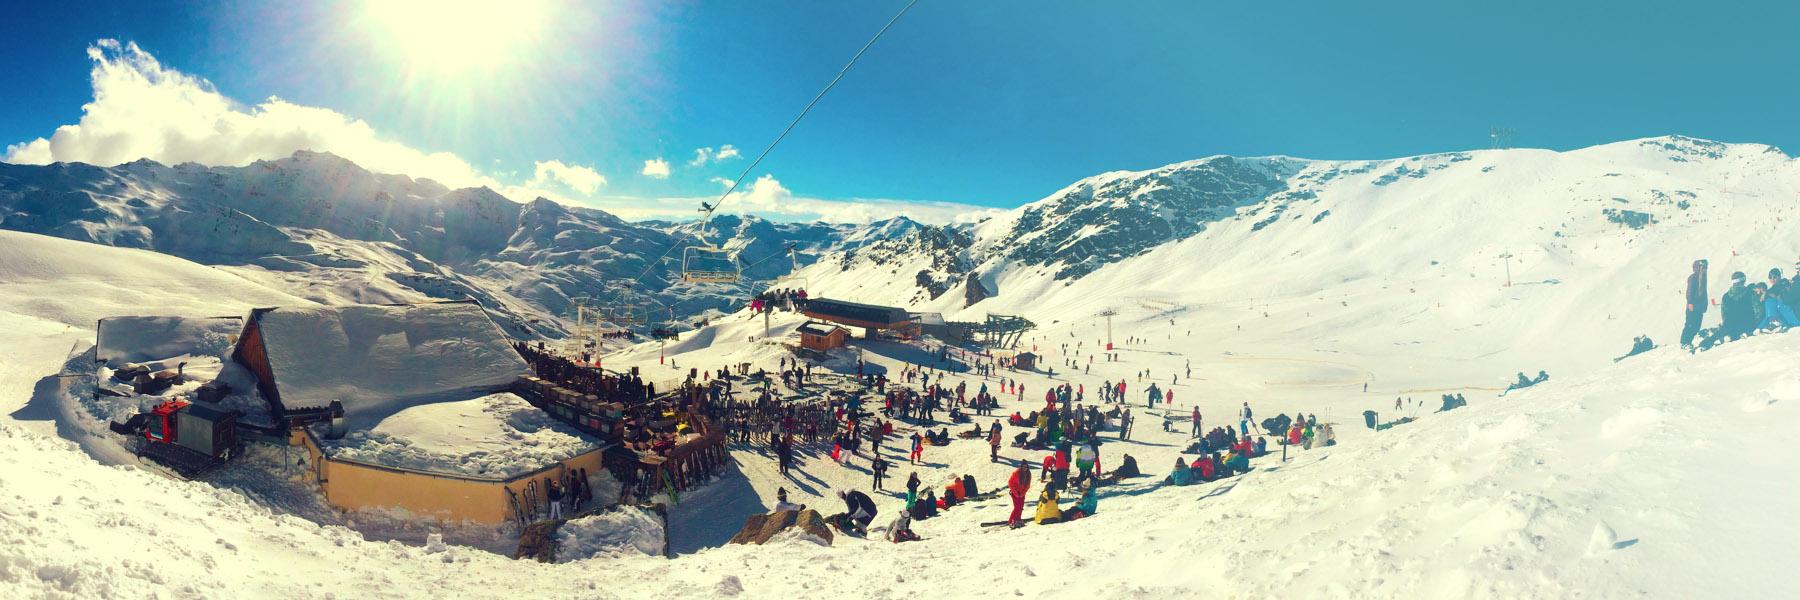 skihomepages_0009_Turquoise Haze